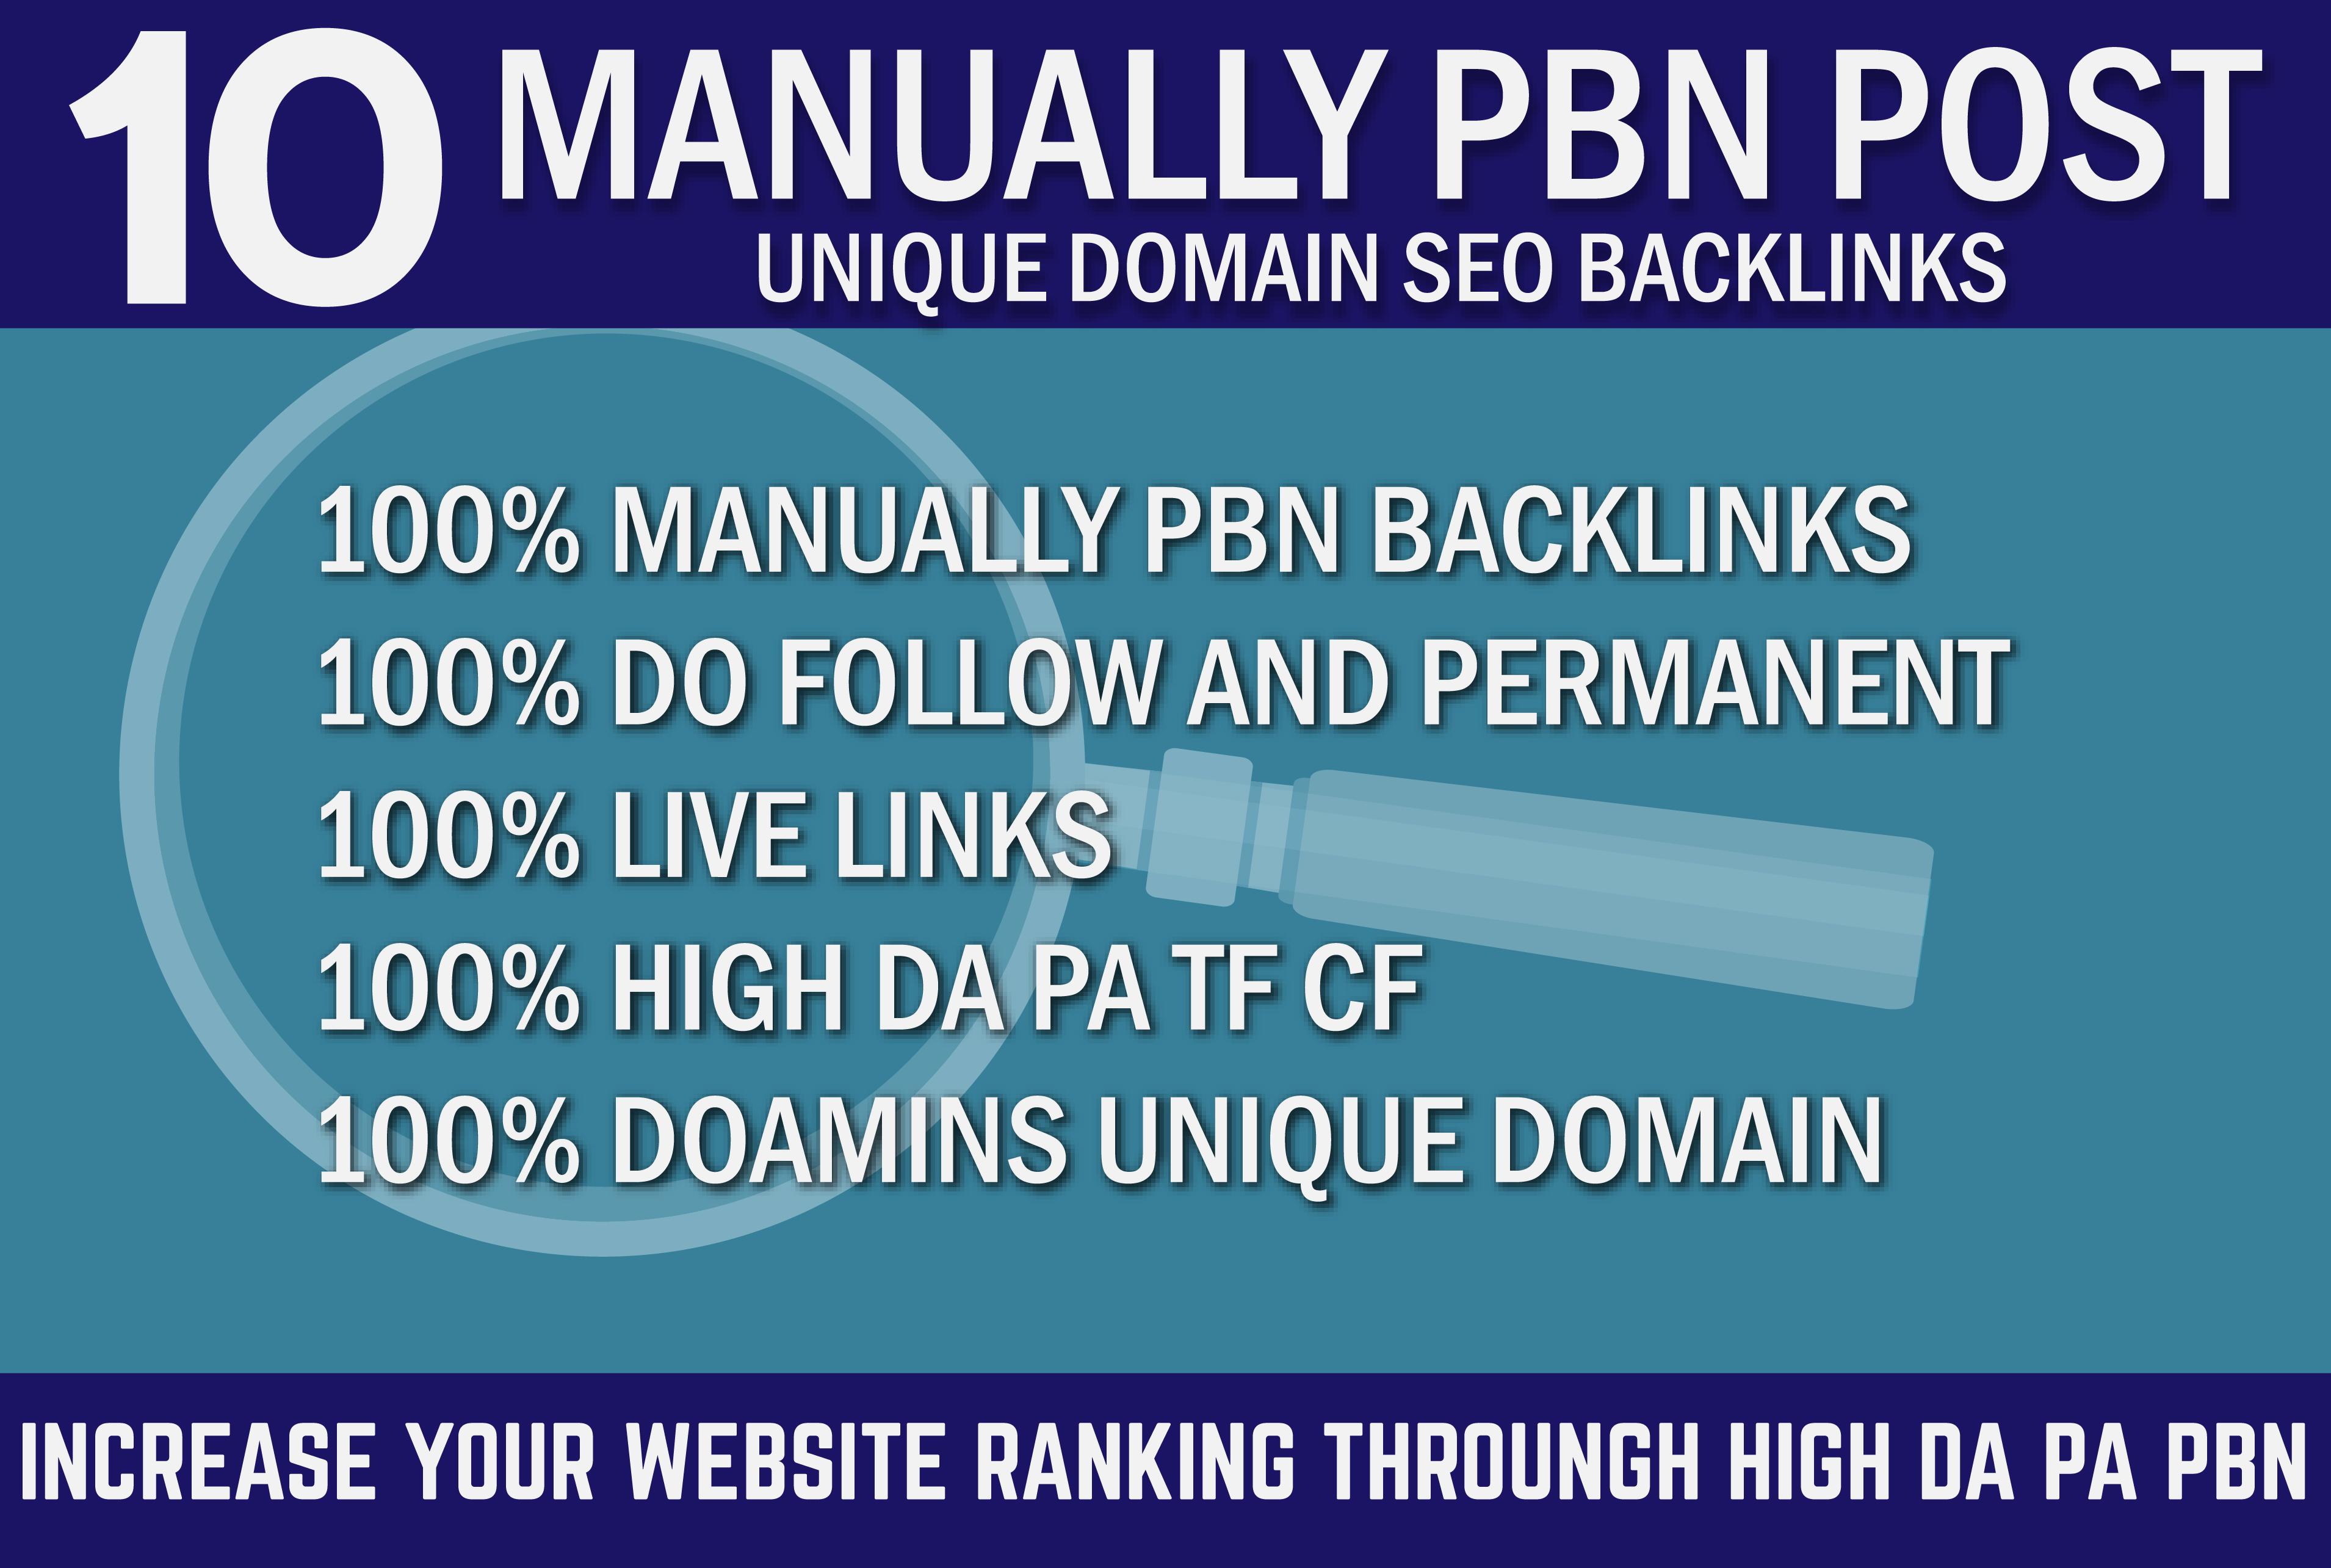 Manually 10 PBN Post SEO Backlinks On High DA 60 PA 50